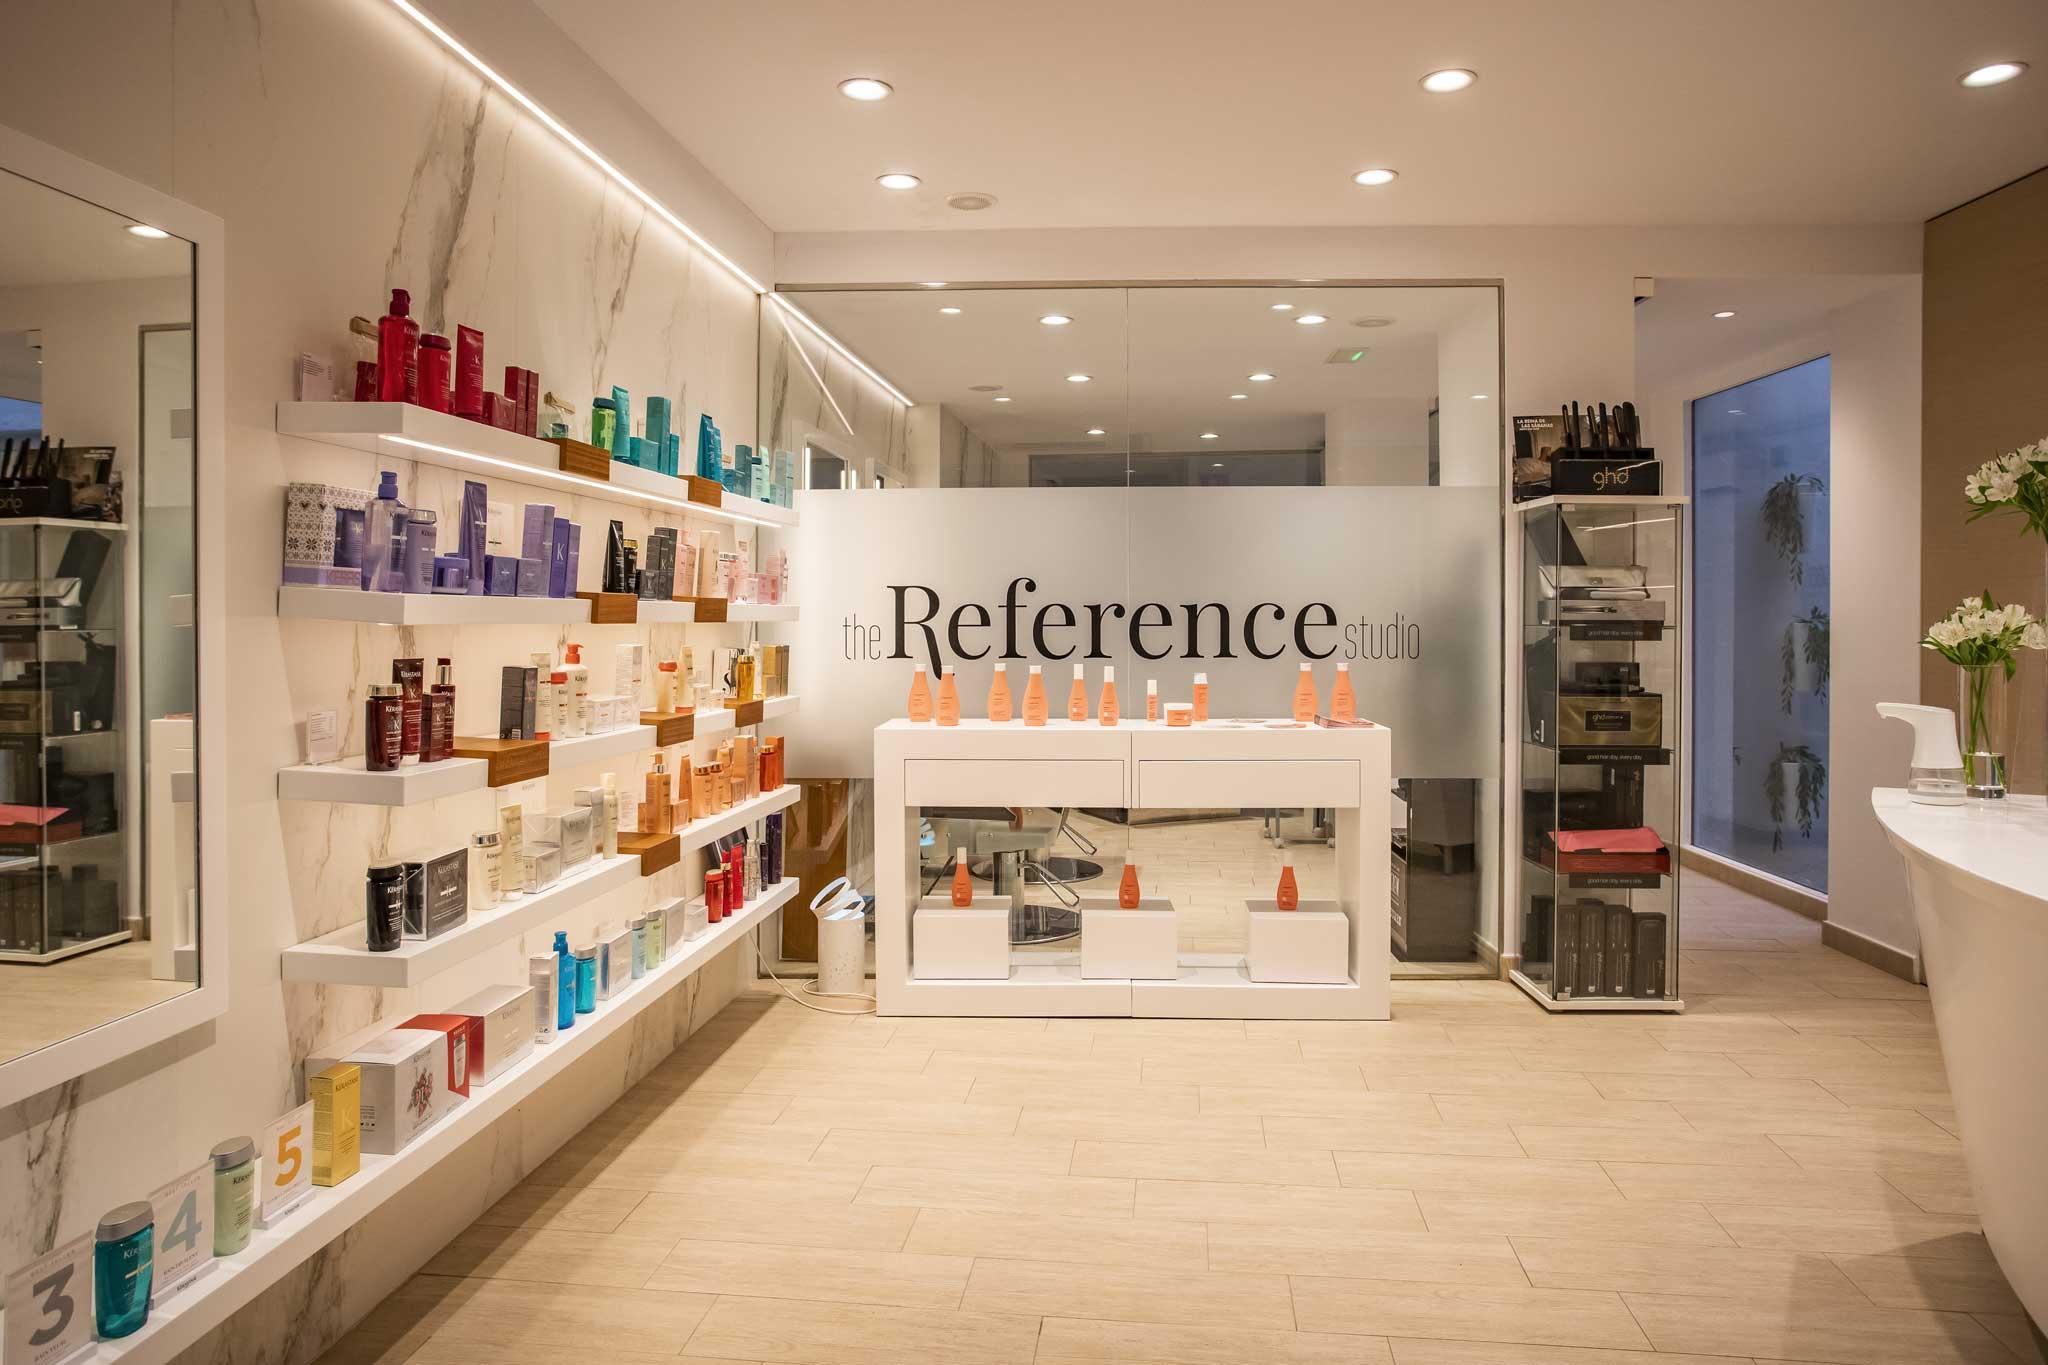 Mejor salon de belleza Denia – The Reference Studio